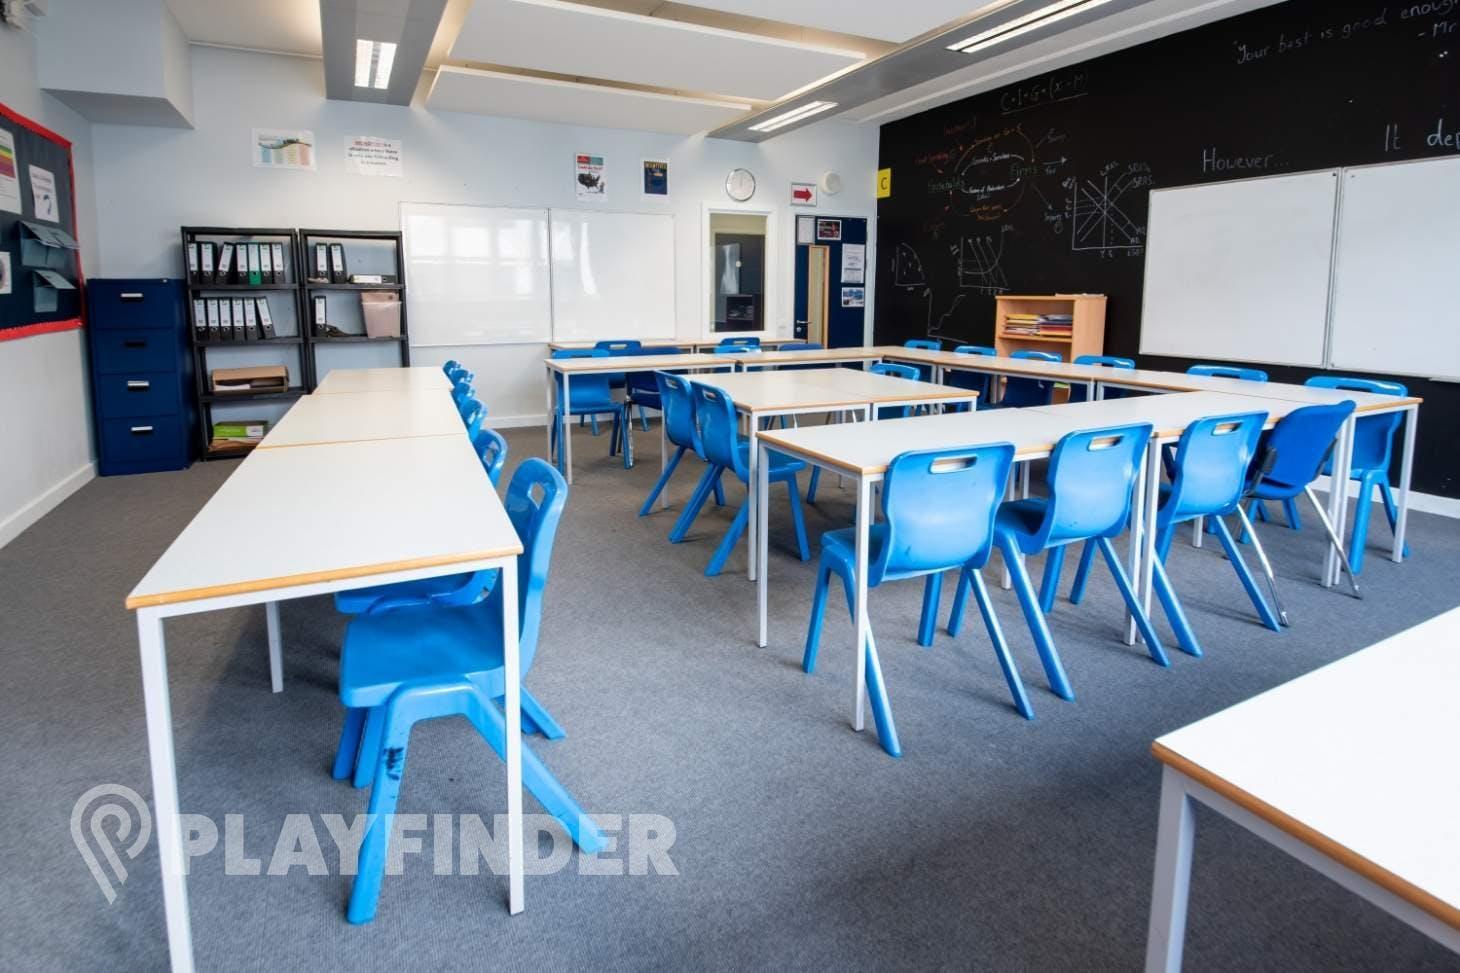 Harris Academy St Johns Wood Classroom space hire